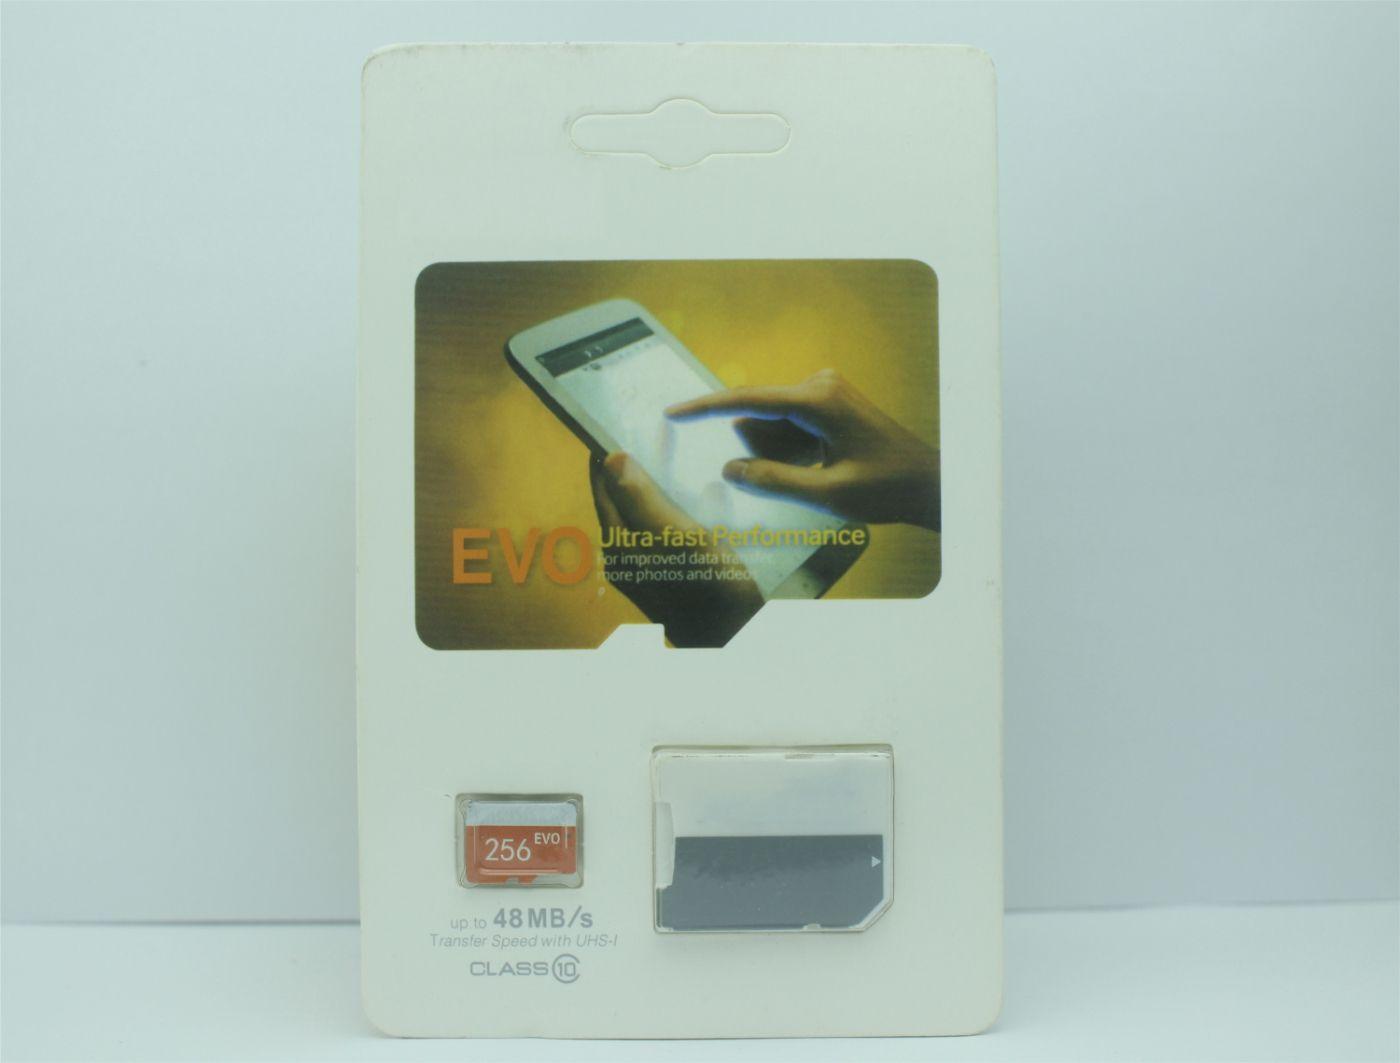 2019 New Hot Class 10 EVO 128GB 64GB 32GB 16GB 8GB SD Card MicroSD TF Memory Card C10 Flash SD Adapter Retail Package